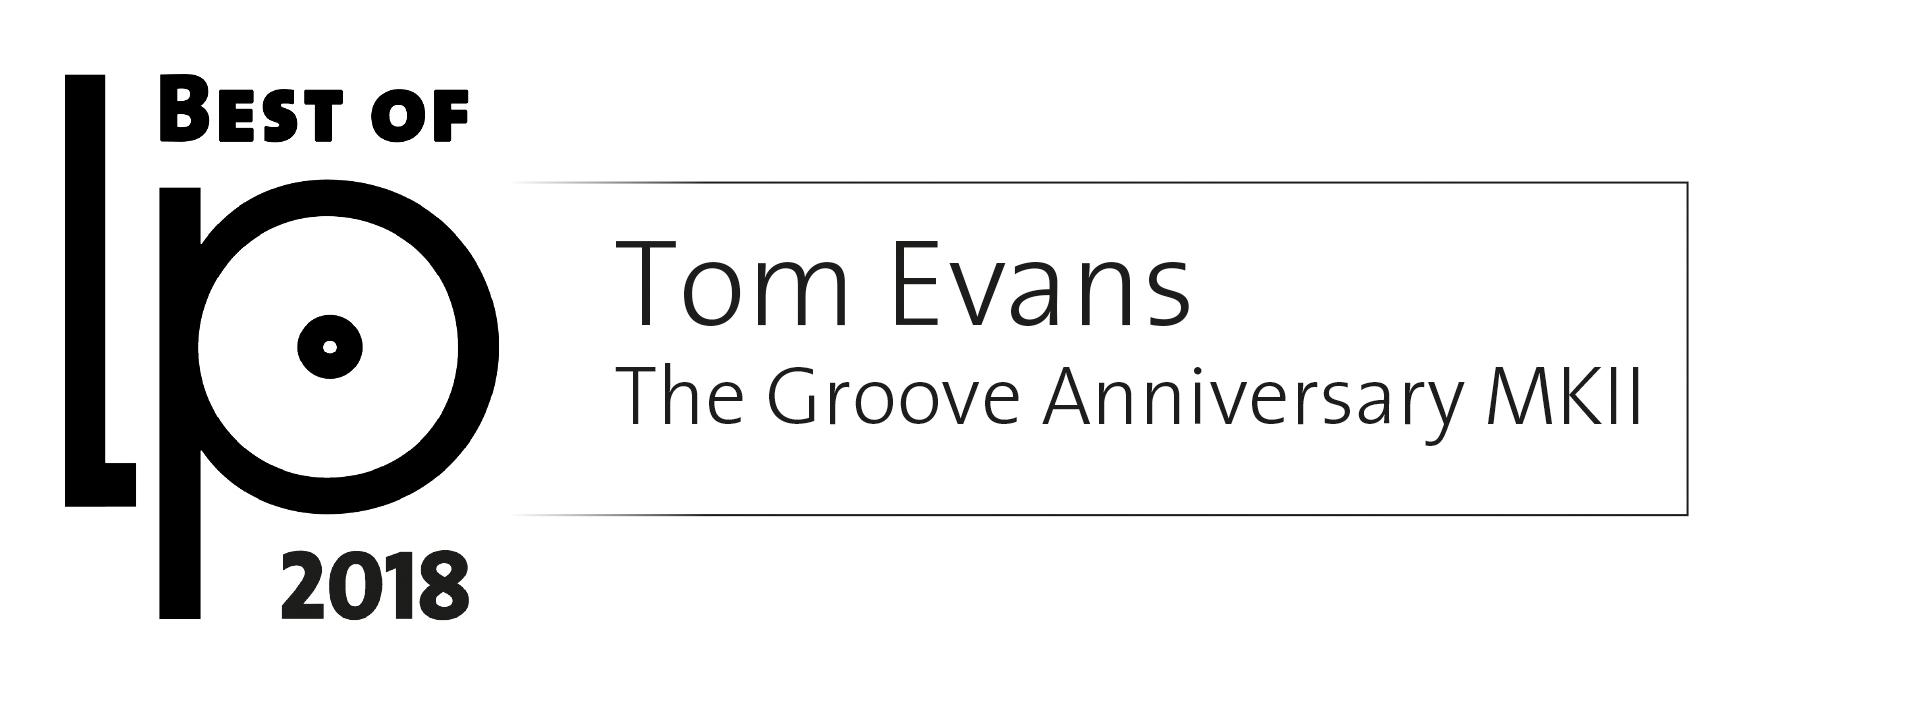 BEST OF LP 2018, TOM EVANS THE GROOVE ANNIVERSARY MK 2